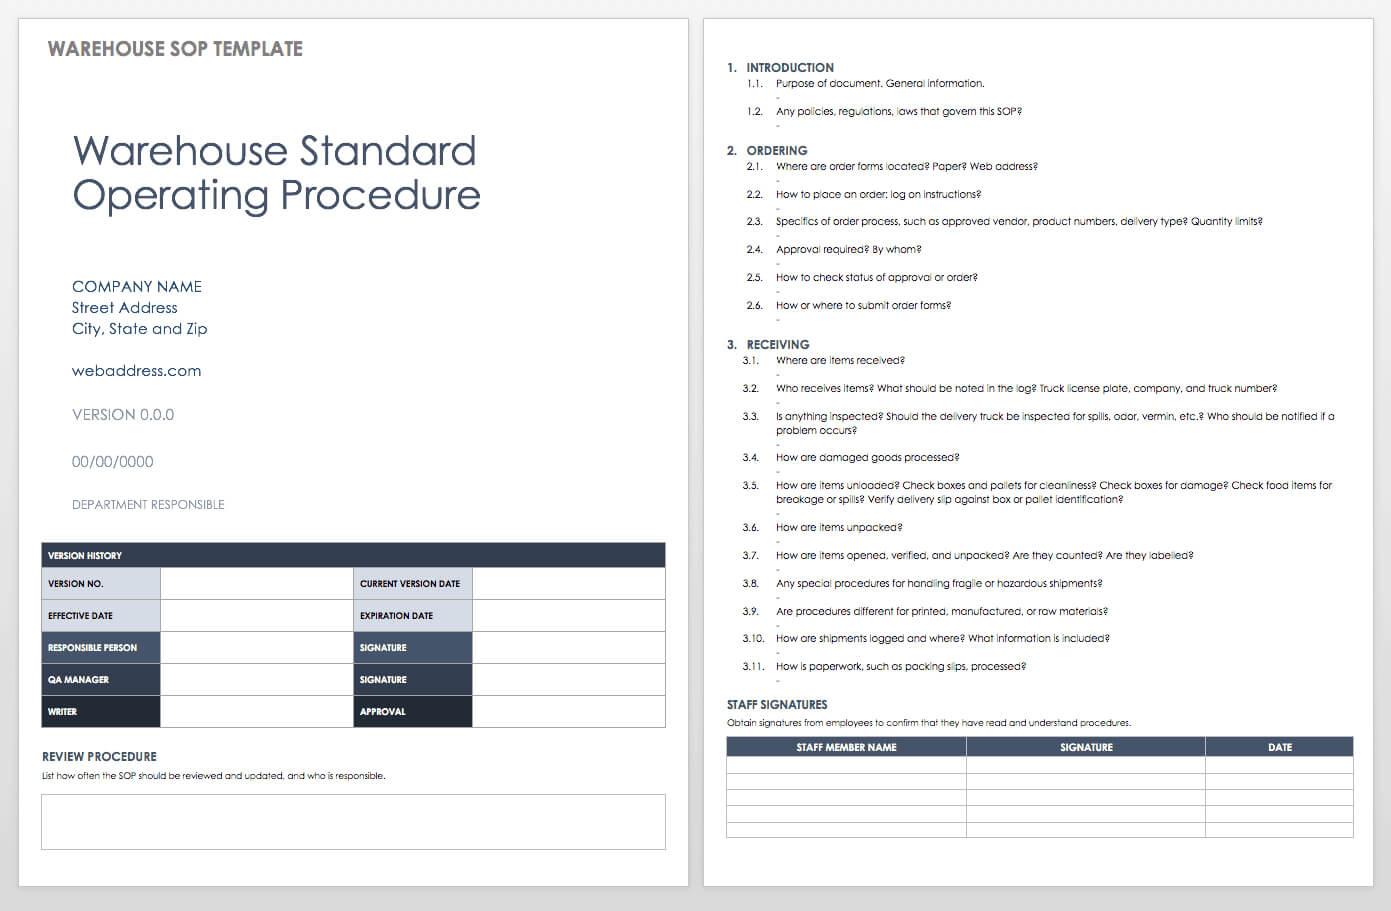 003 Standard Operating Procedure Template Word Ic Warehouse In Free Standard Operating Procedure Template Word 2010